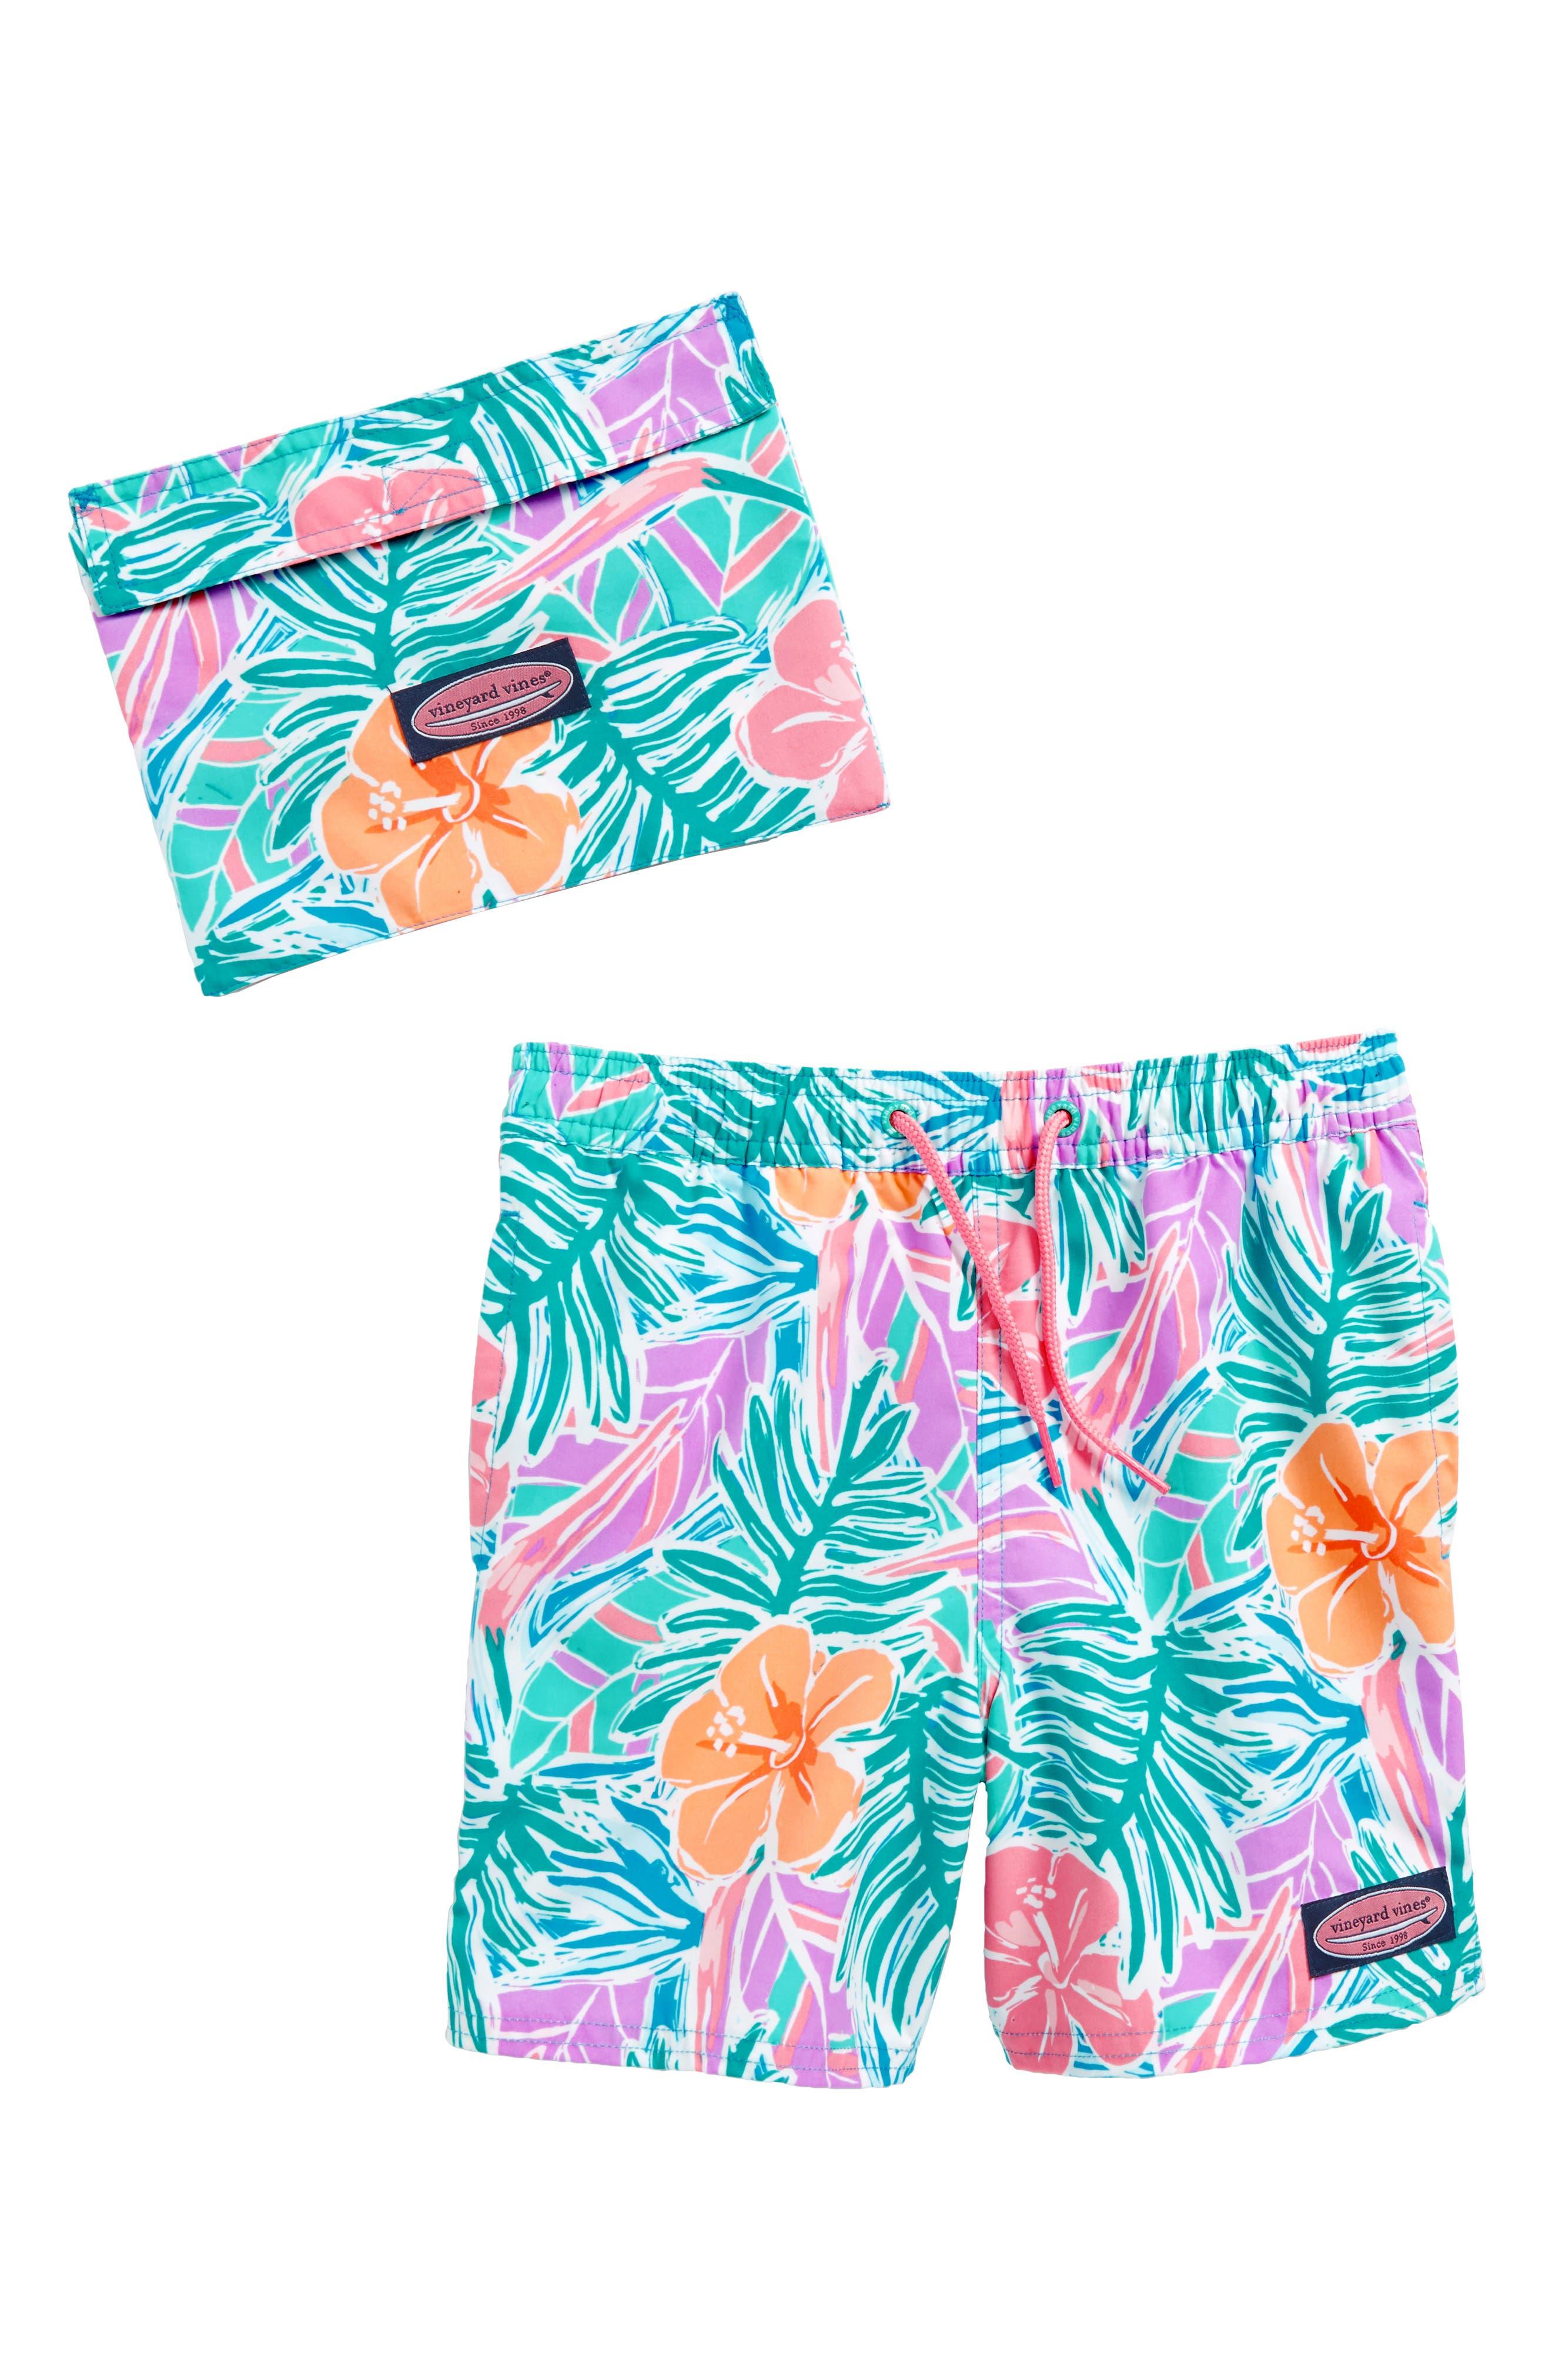 Chappy Gulf Tropical Swim Trunks,                         Main,                         color, Island Blue